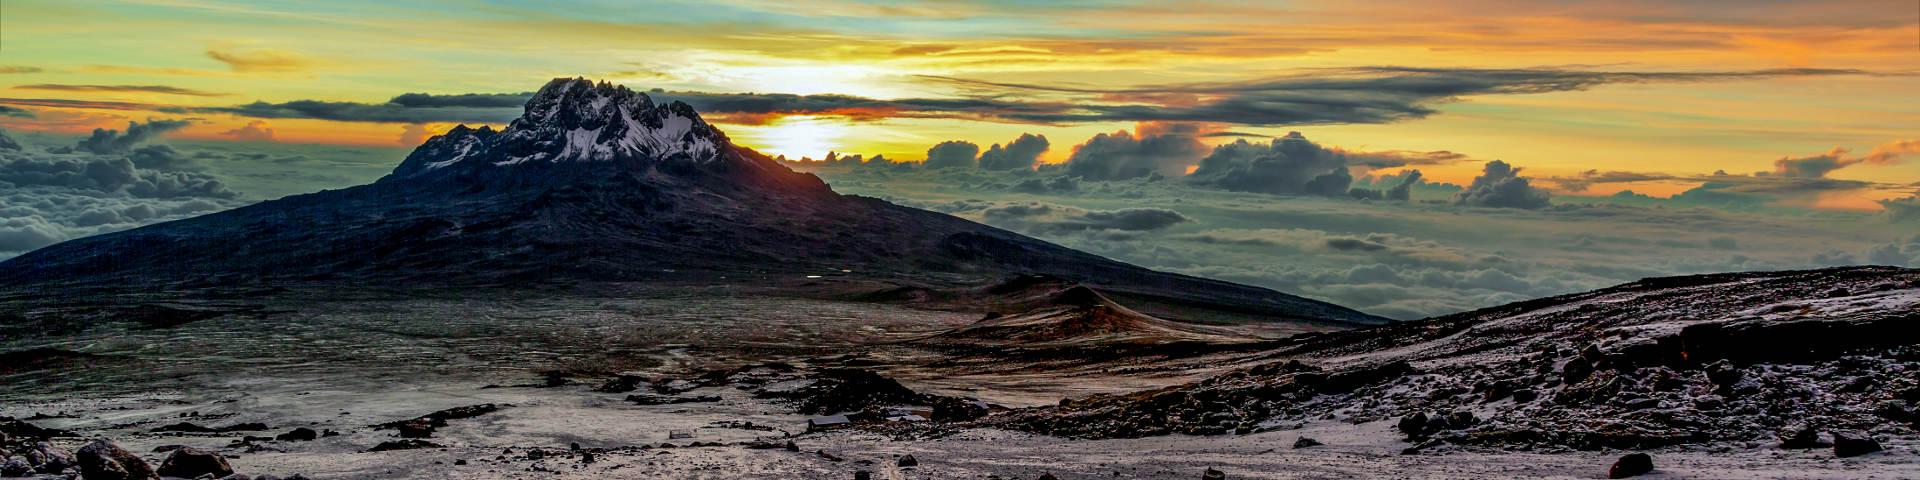 Kilimanjaro hero